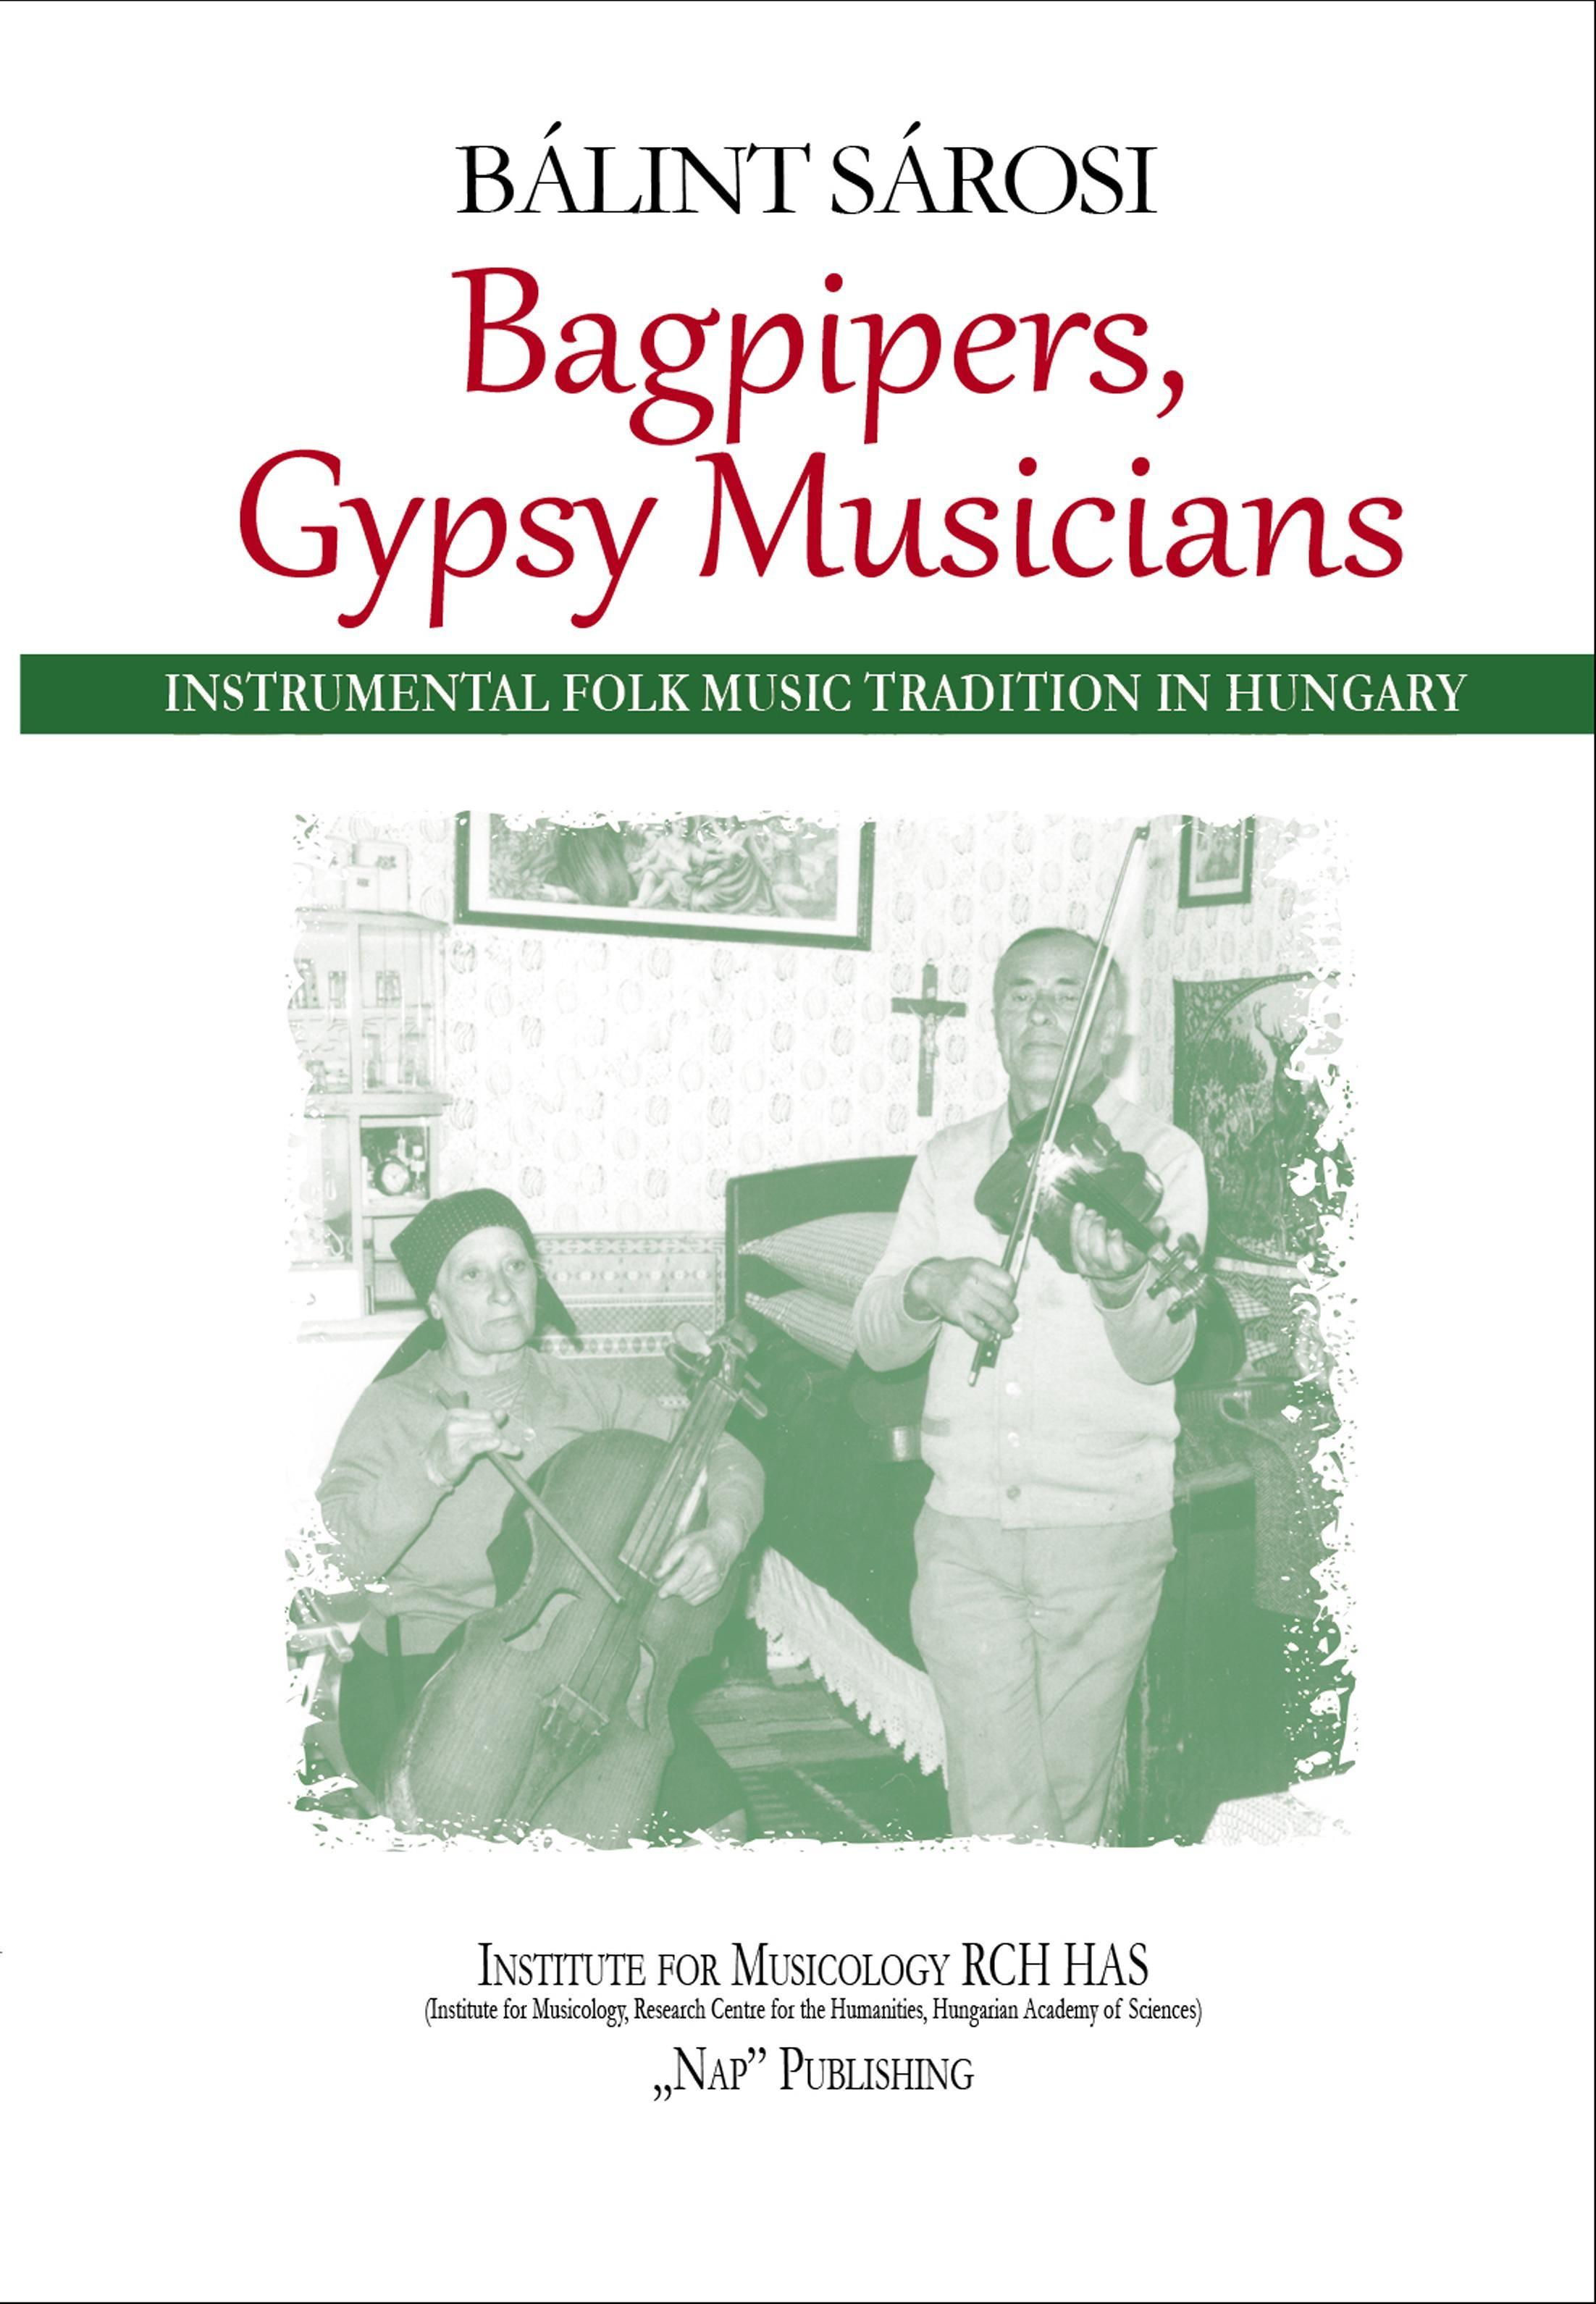 SÁROSI BÁLINT - BAGPIPERS, GYPSY MUSICIANS